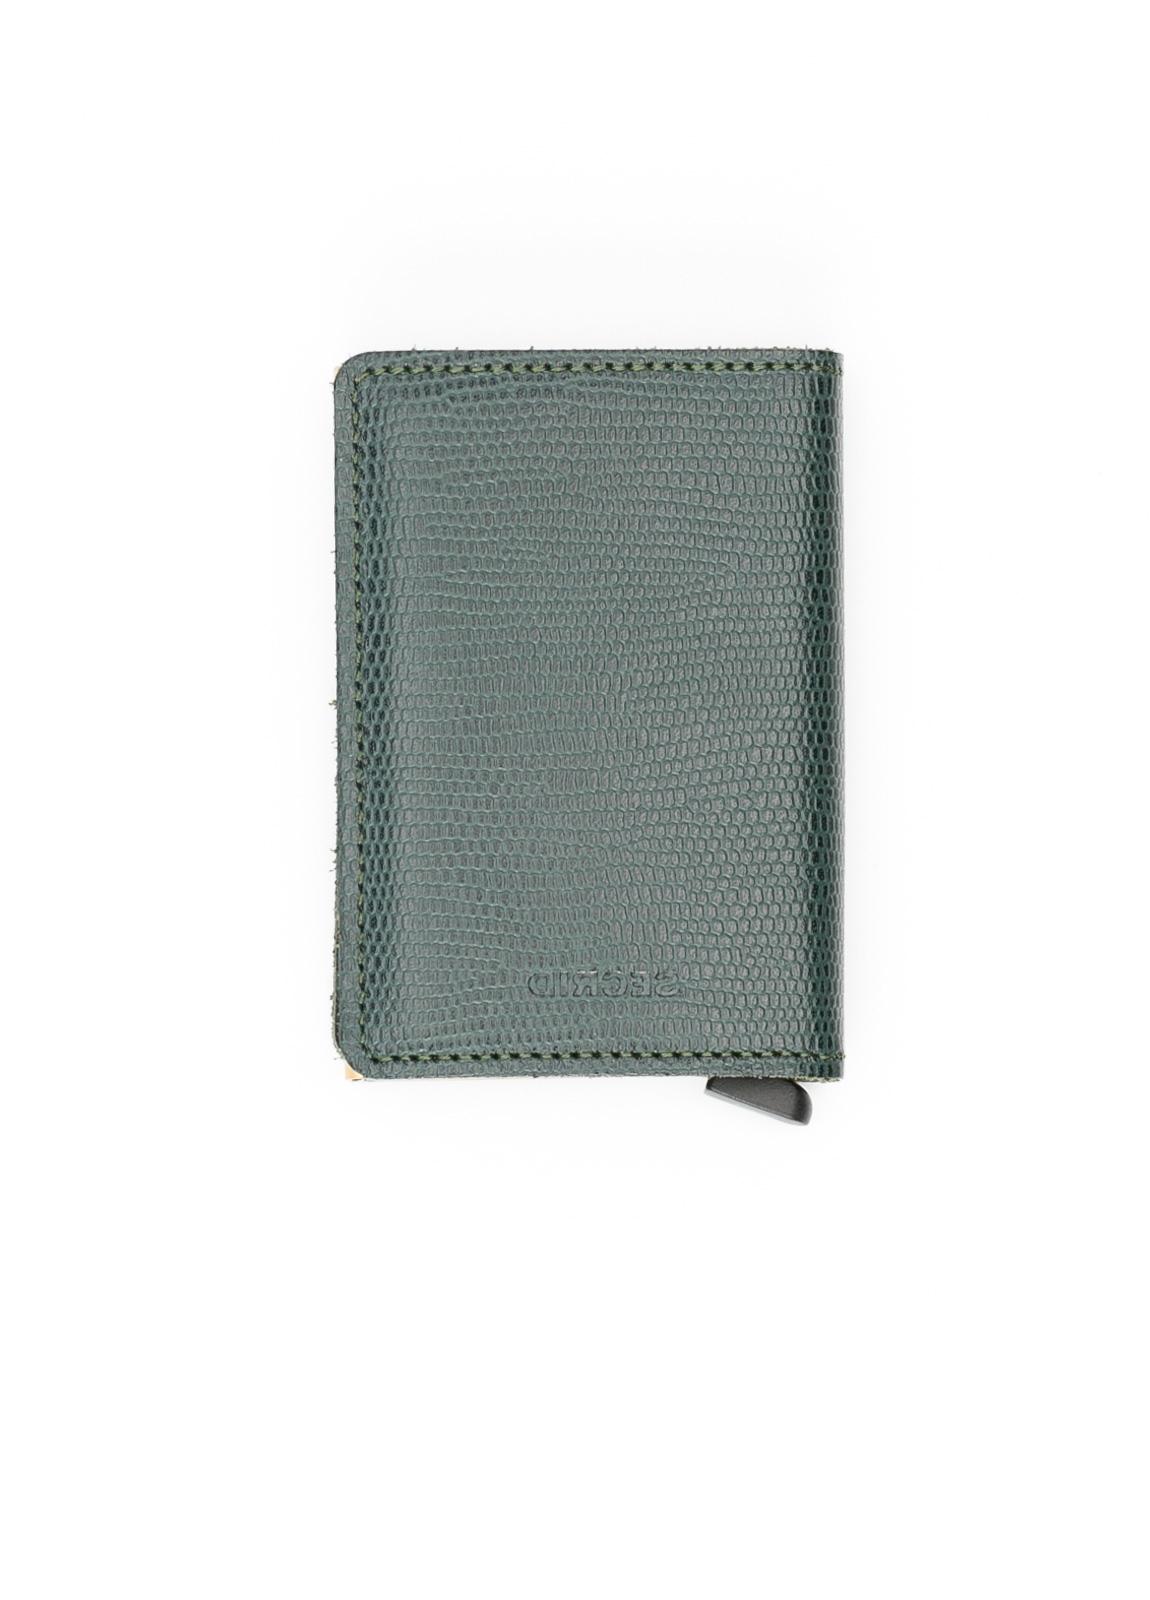 Secrid slim wallet color verde, con cardprotector de aluminio ultrafino.